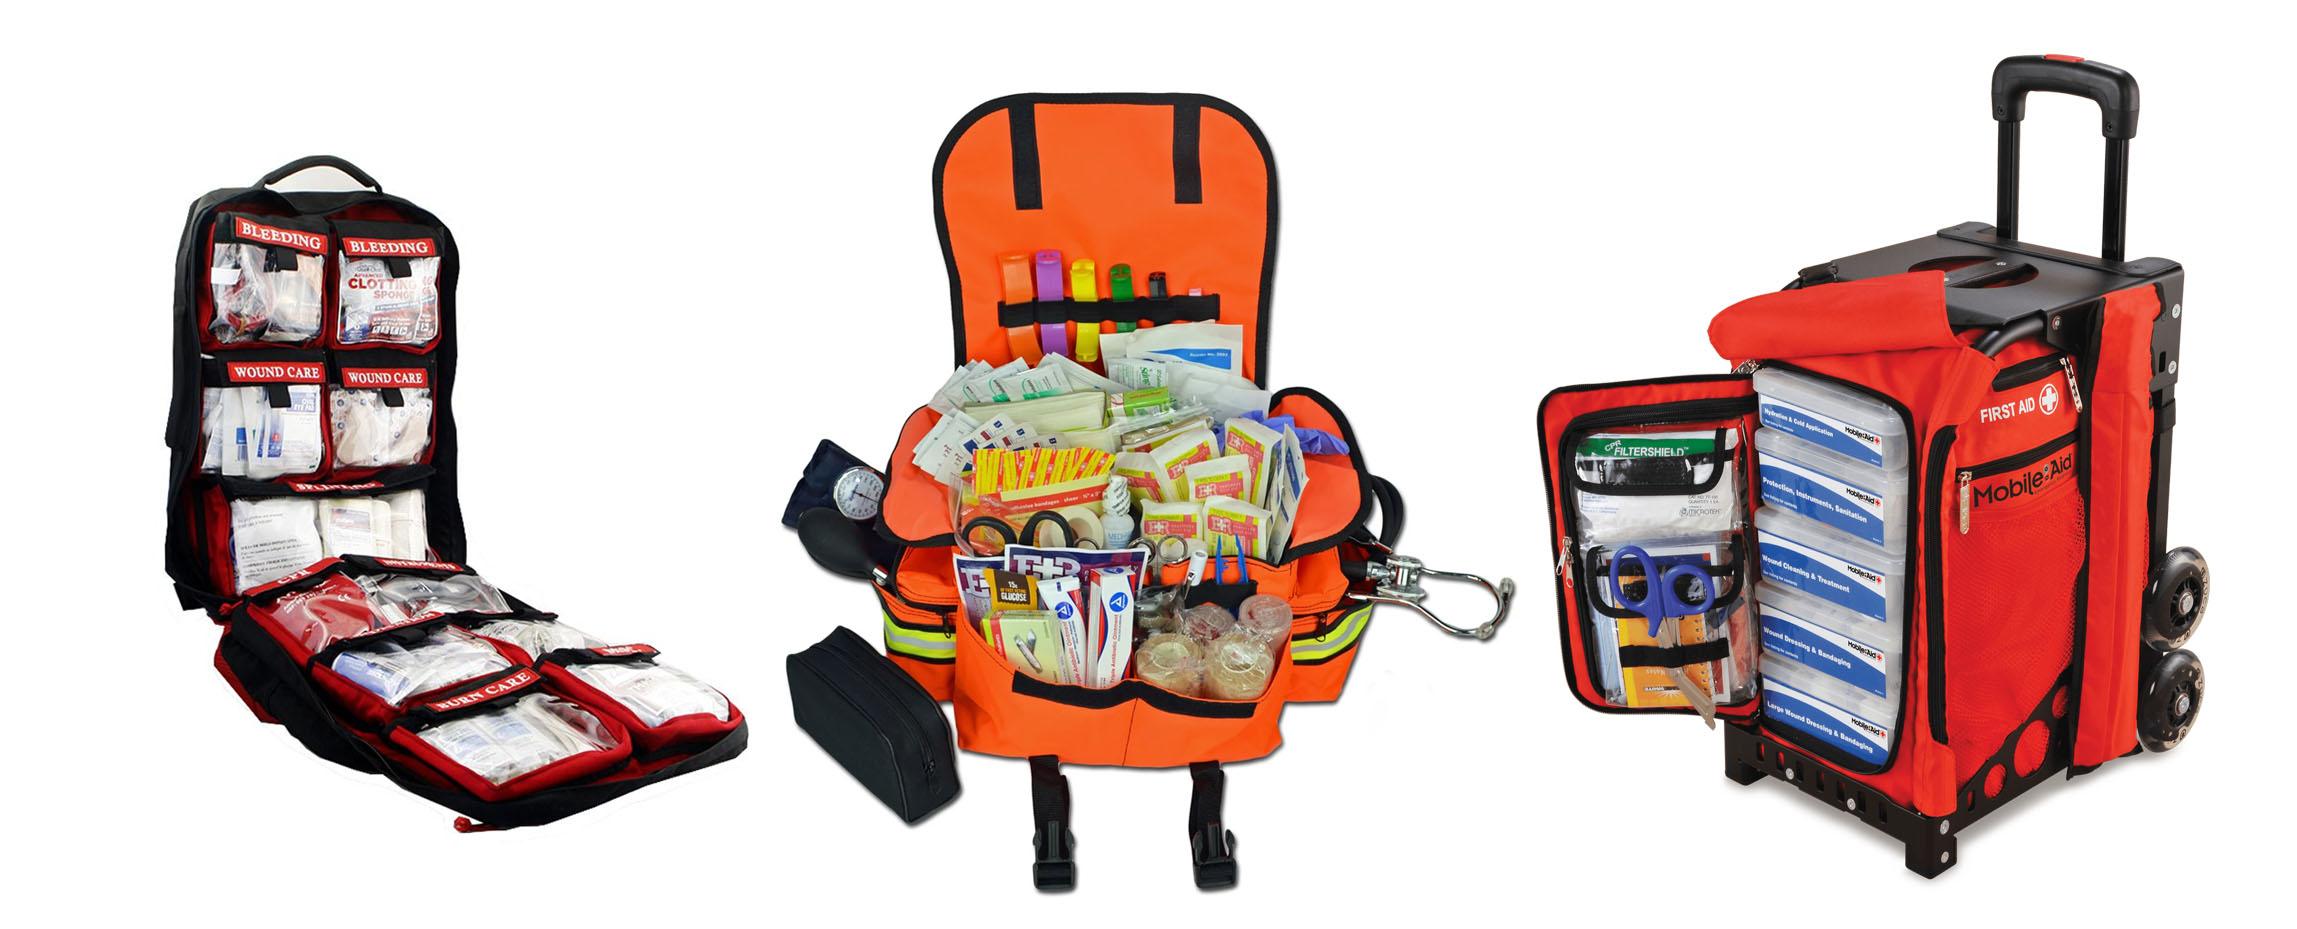 Different Variants of Trauma First Aid Kits